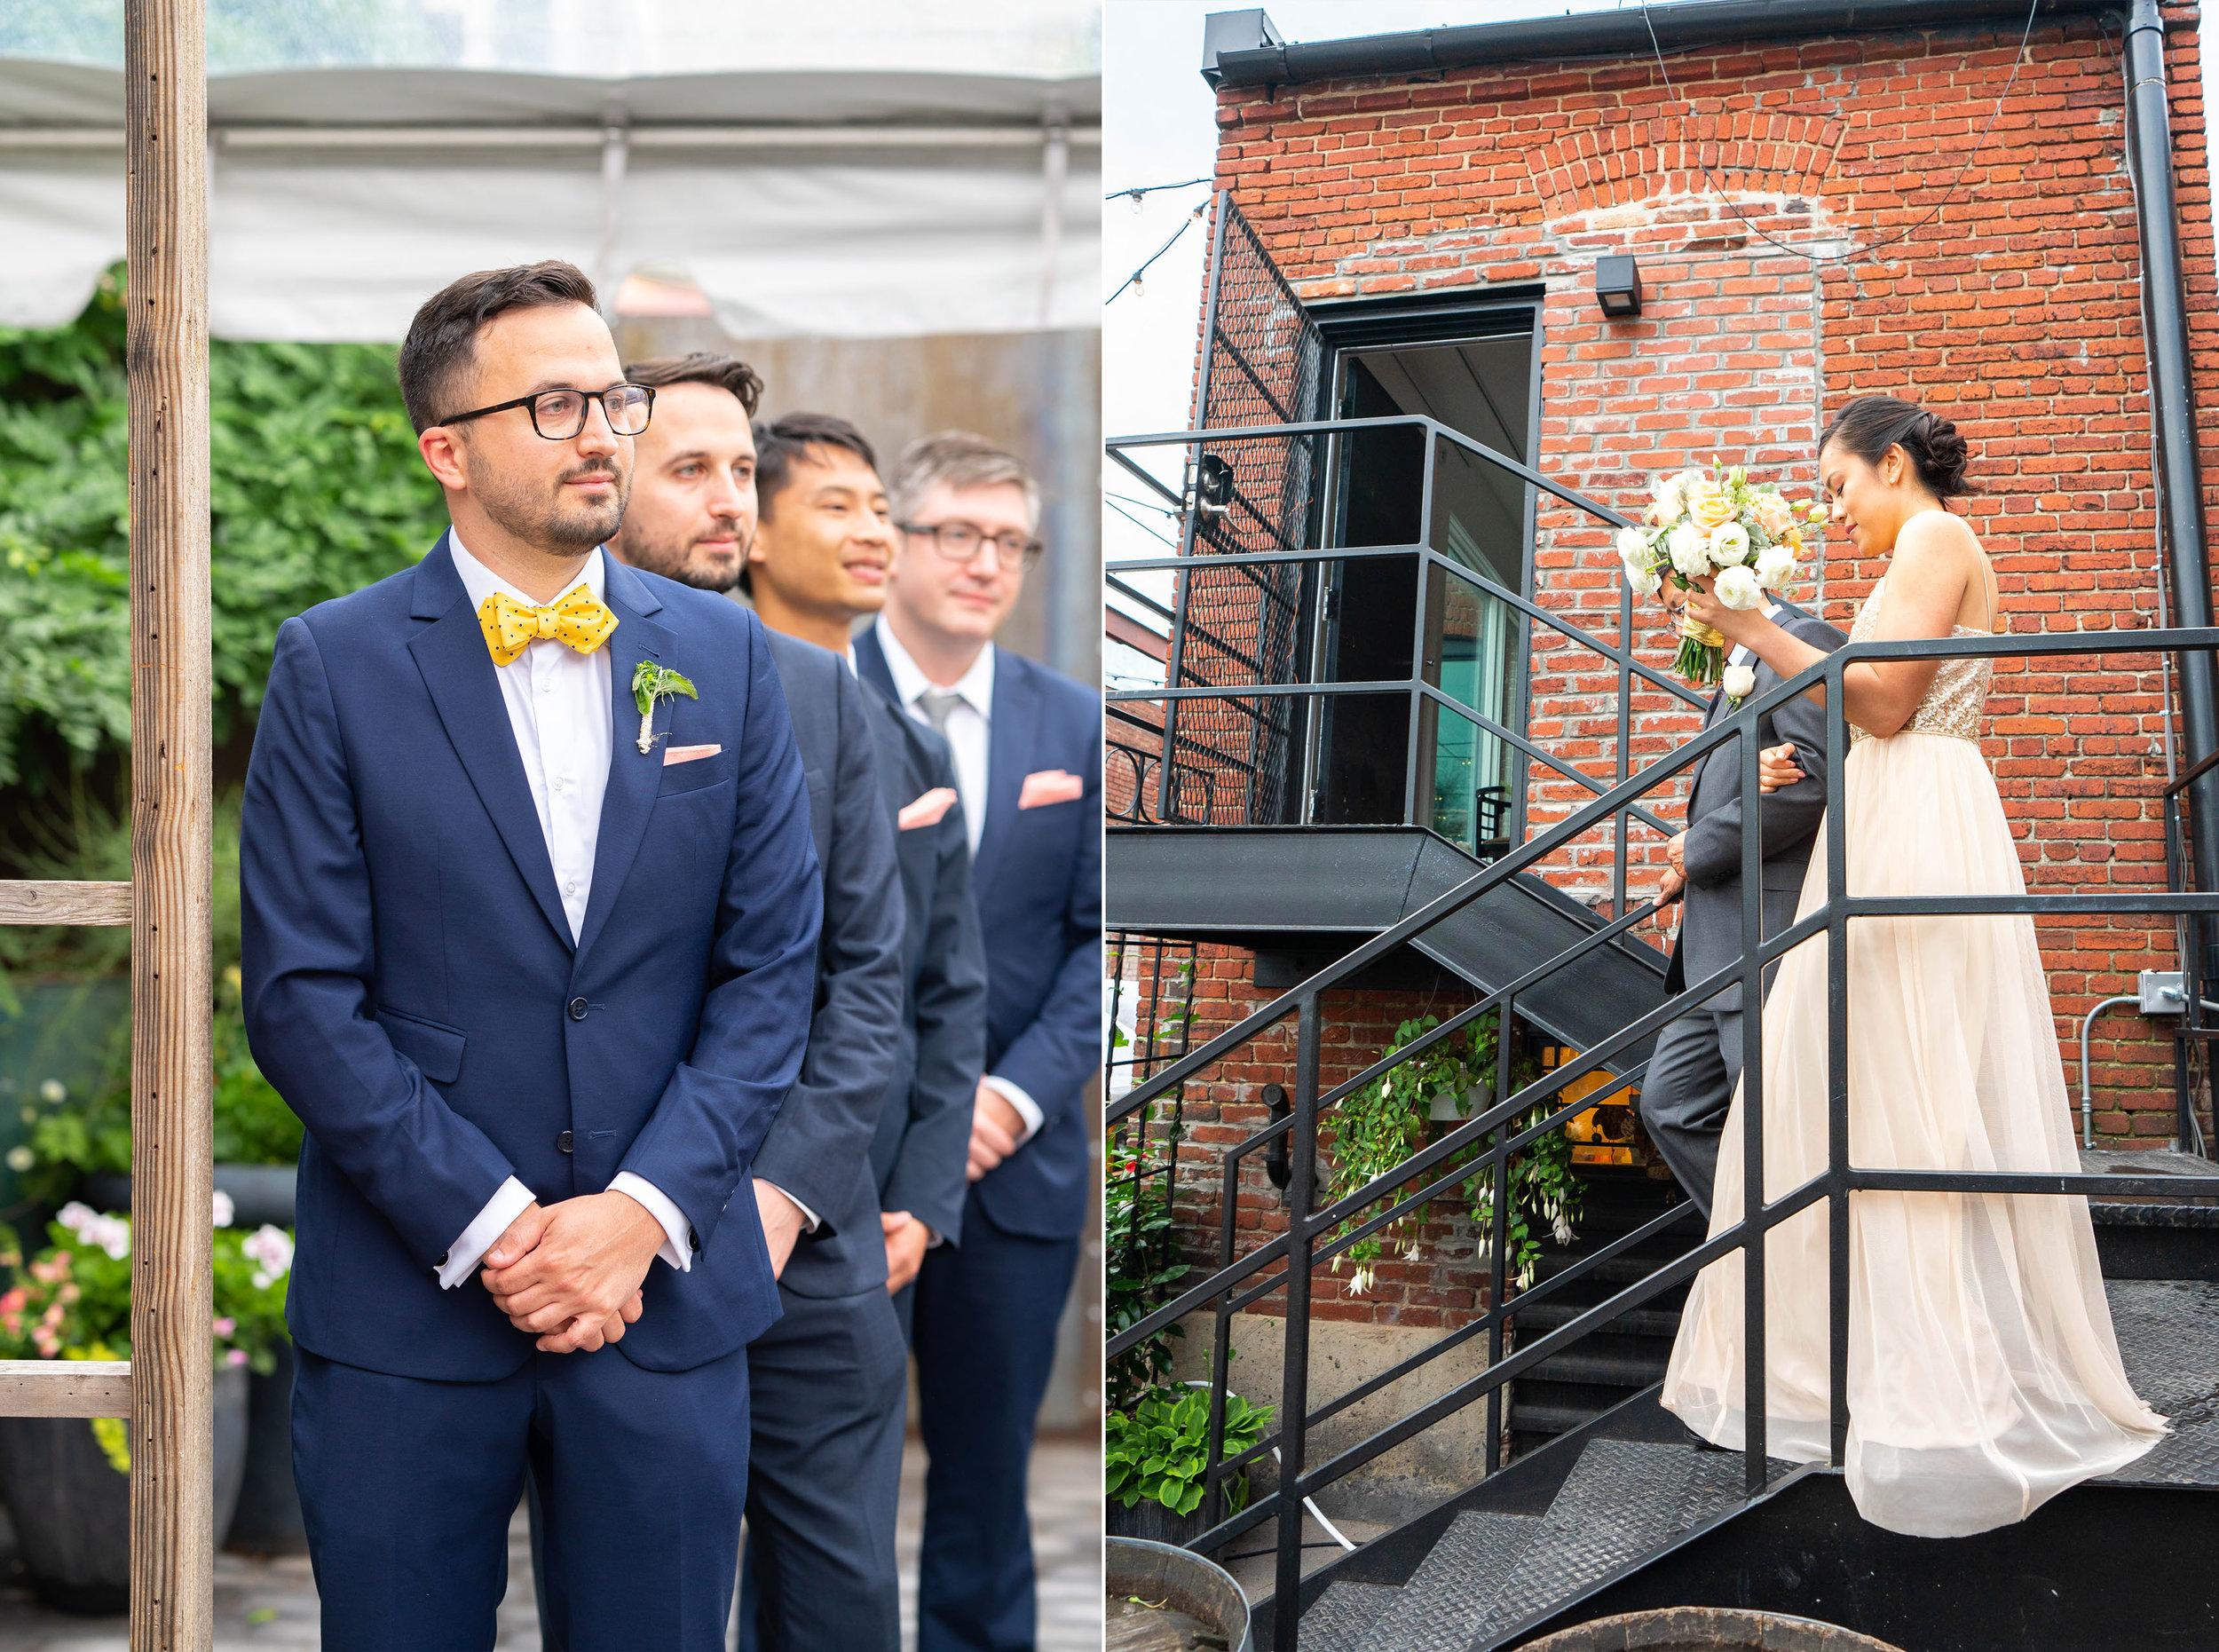 Urban wedding venue in DC Gallery OonH by Jessica Nazarova Photography